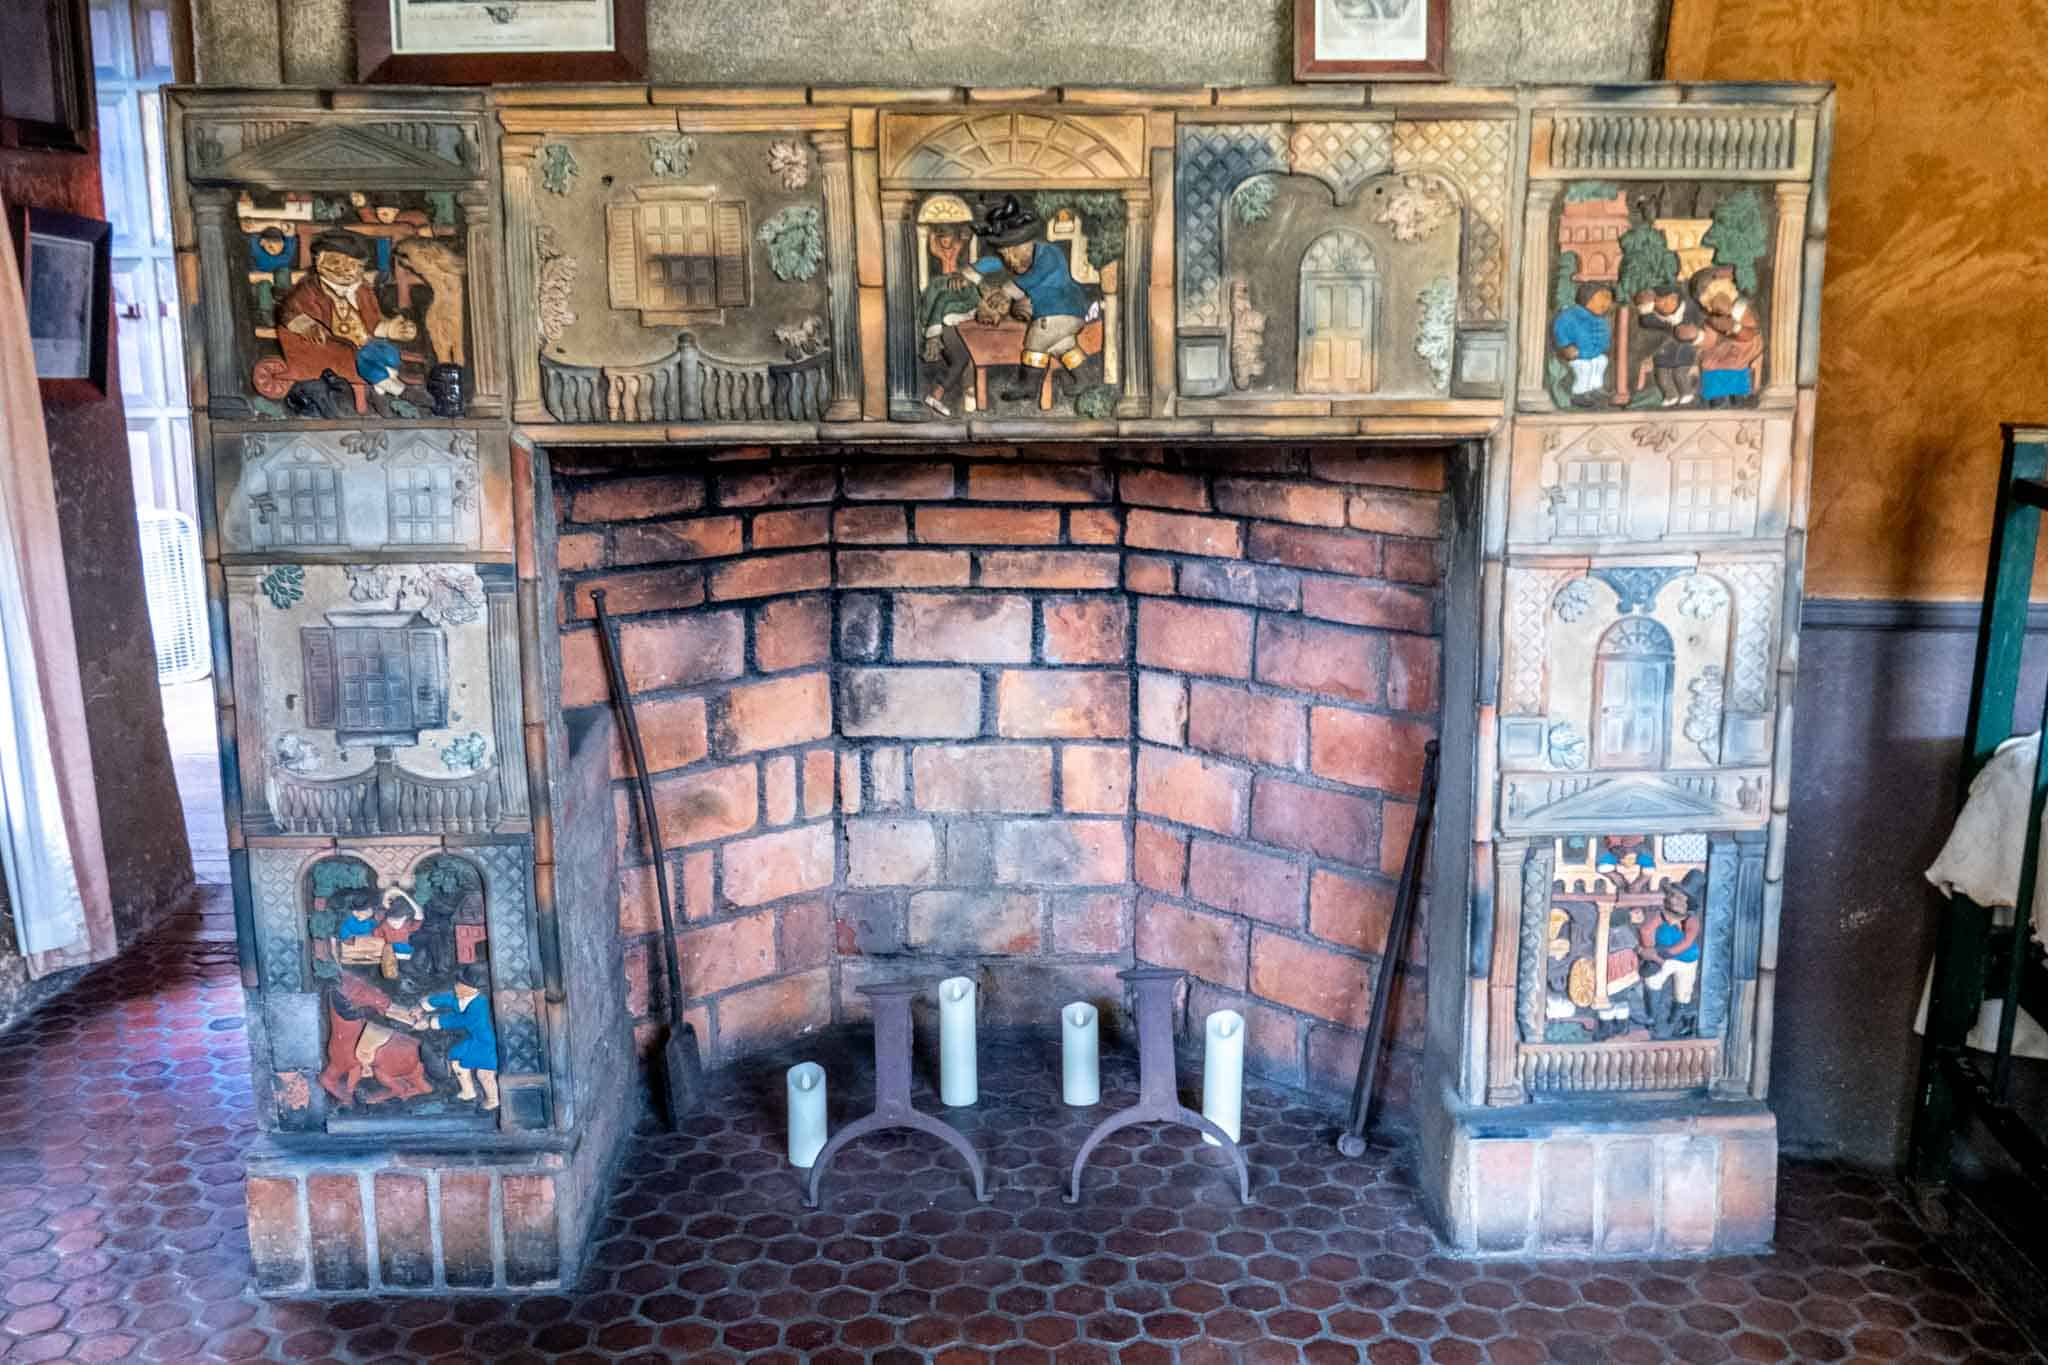 Ceramic tilework on a fireplace